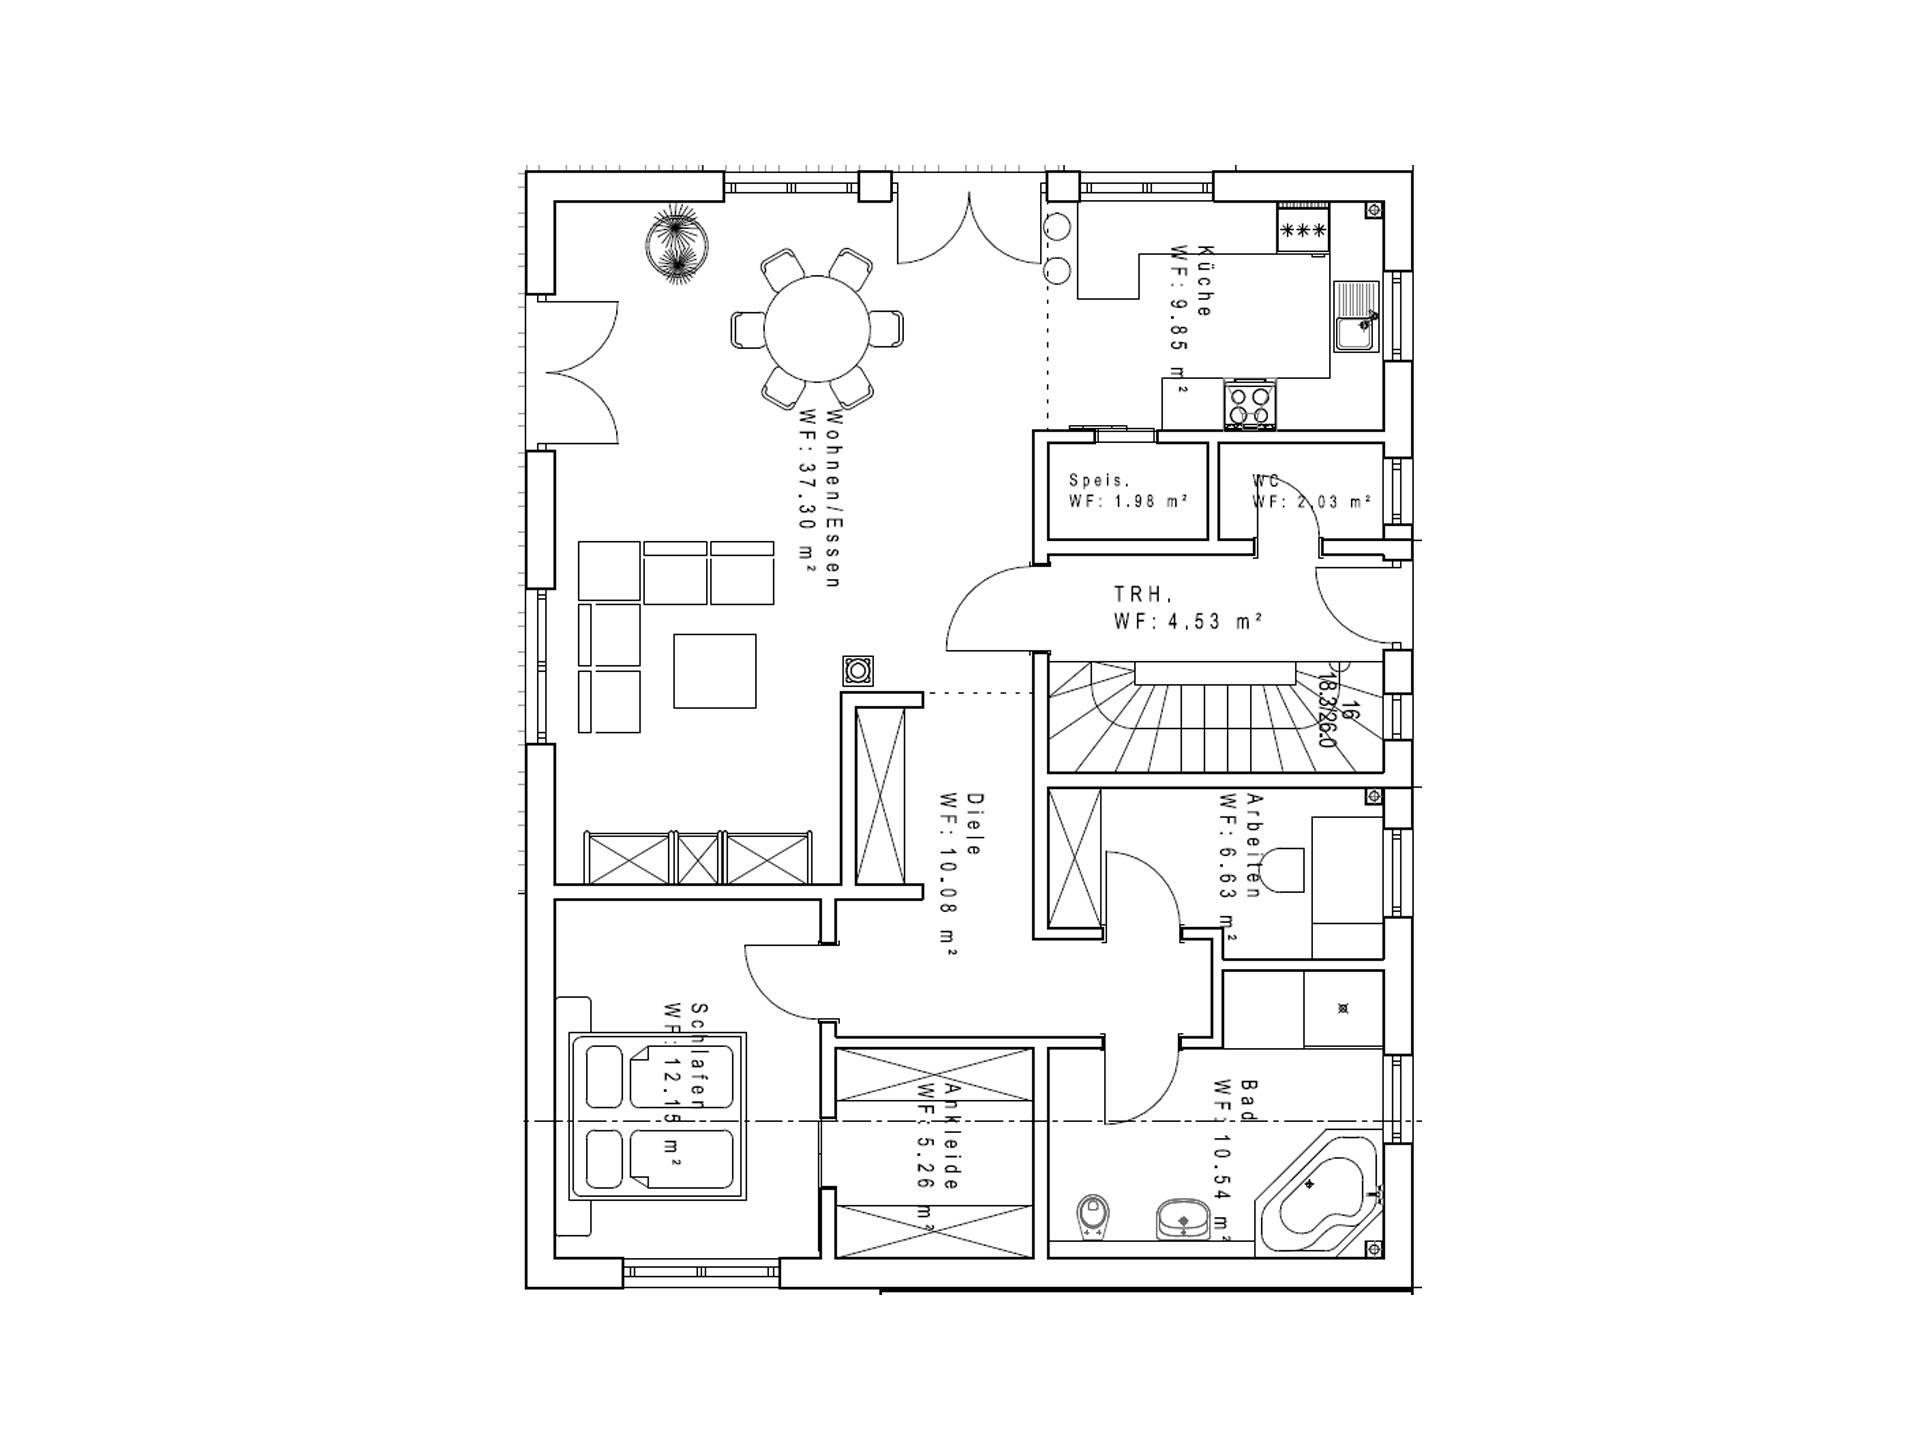 Zweifamilienhaus sd191 2f sachsenheimer fertighaus for Zweifamilienhaus grundriss fertighaus